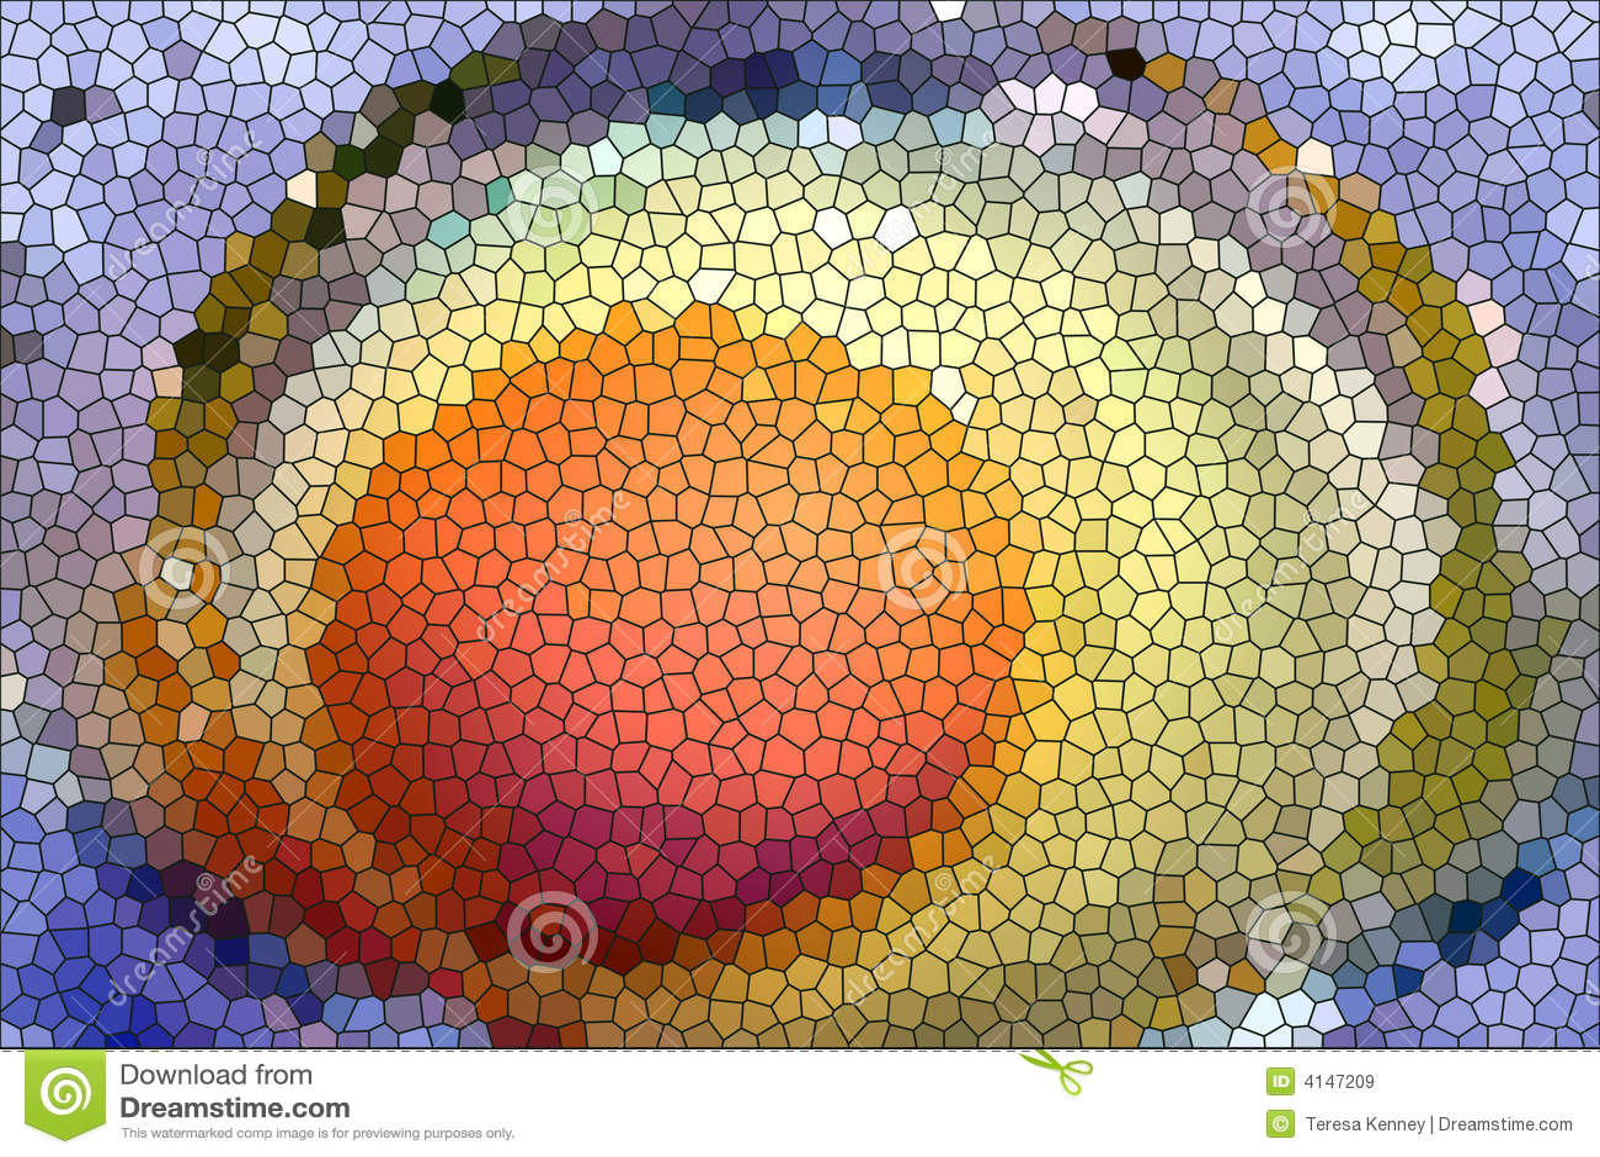 Egg mosaic royalty free stock images image 4147209 for Egg mosaic design